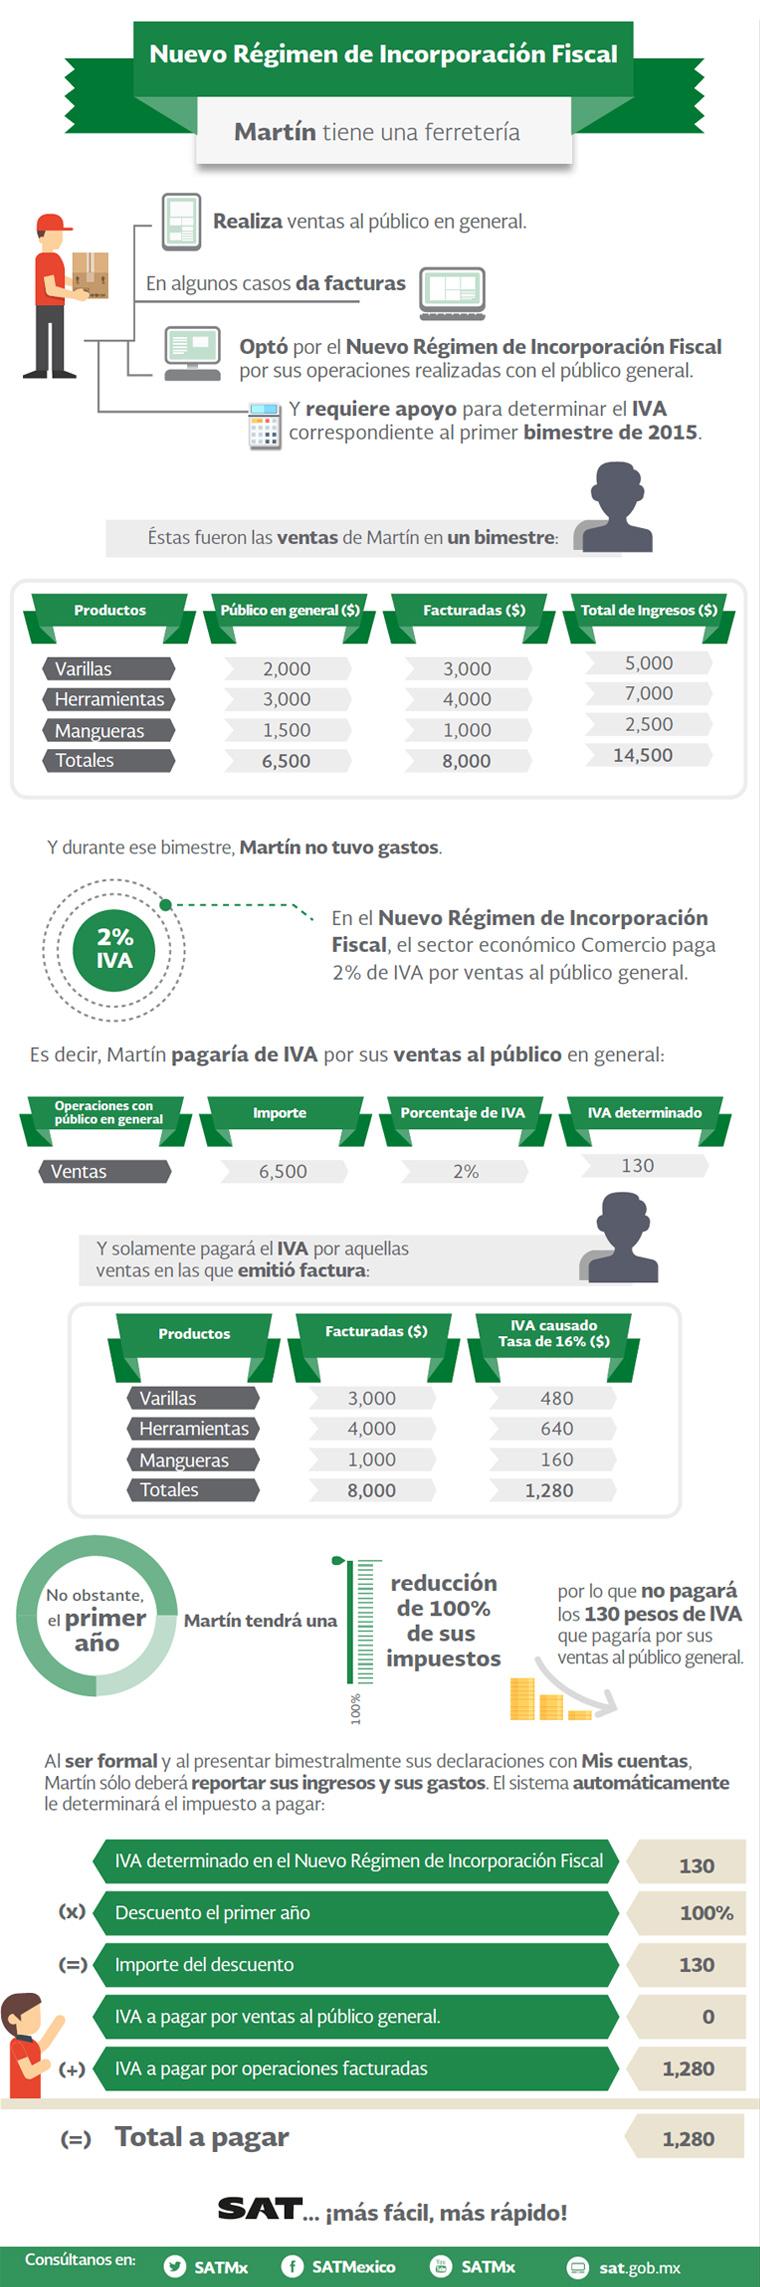 infografia_nuevoregimen_ejemplo